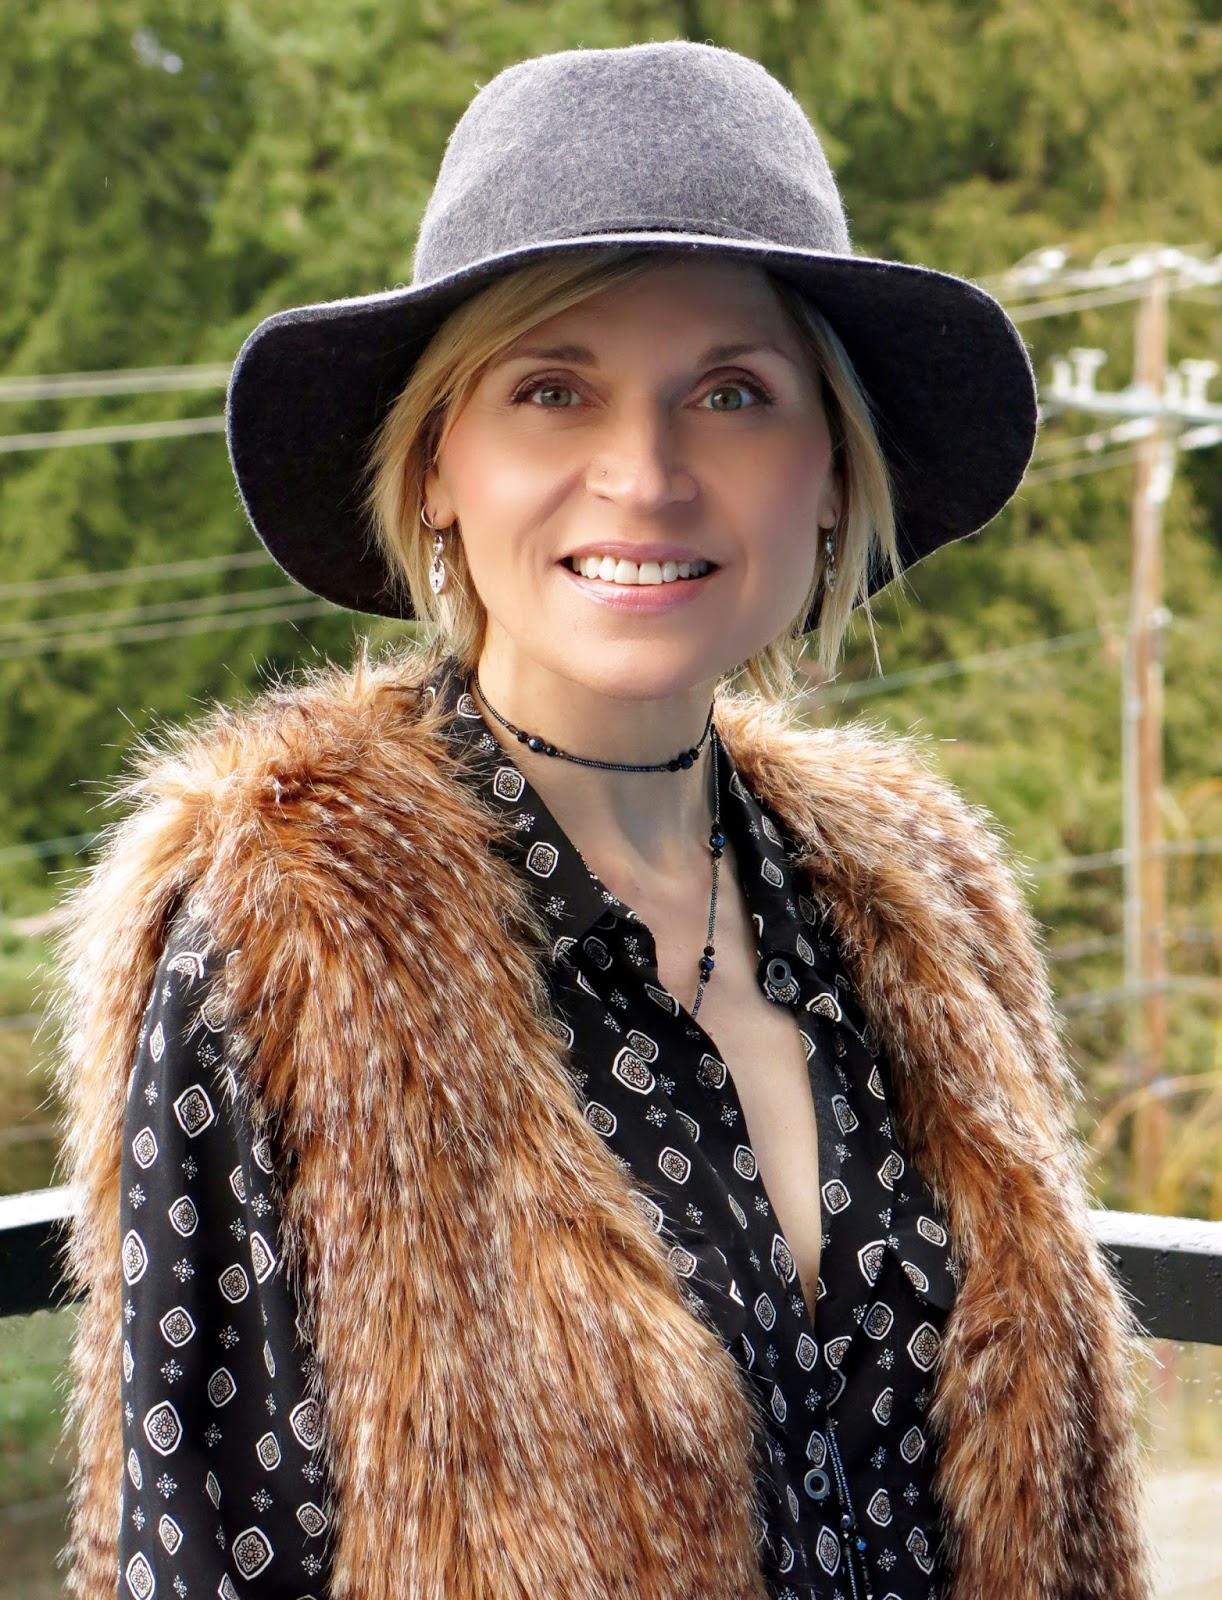 black patterned shirt, long faux-fur vest, and floppy hat